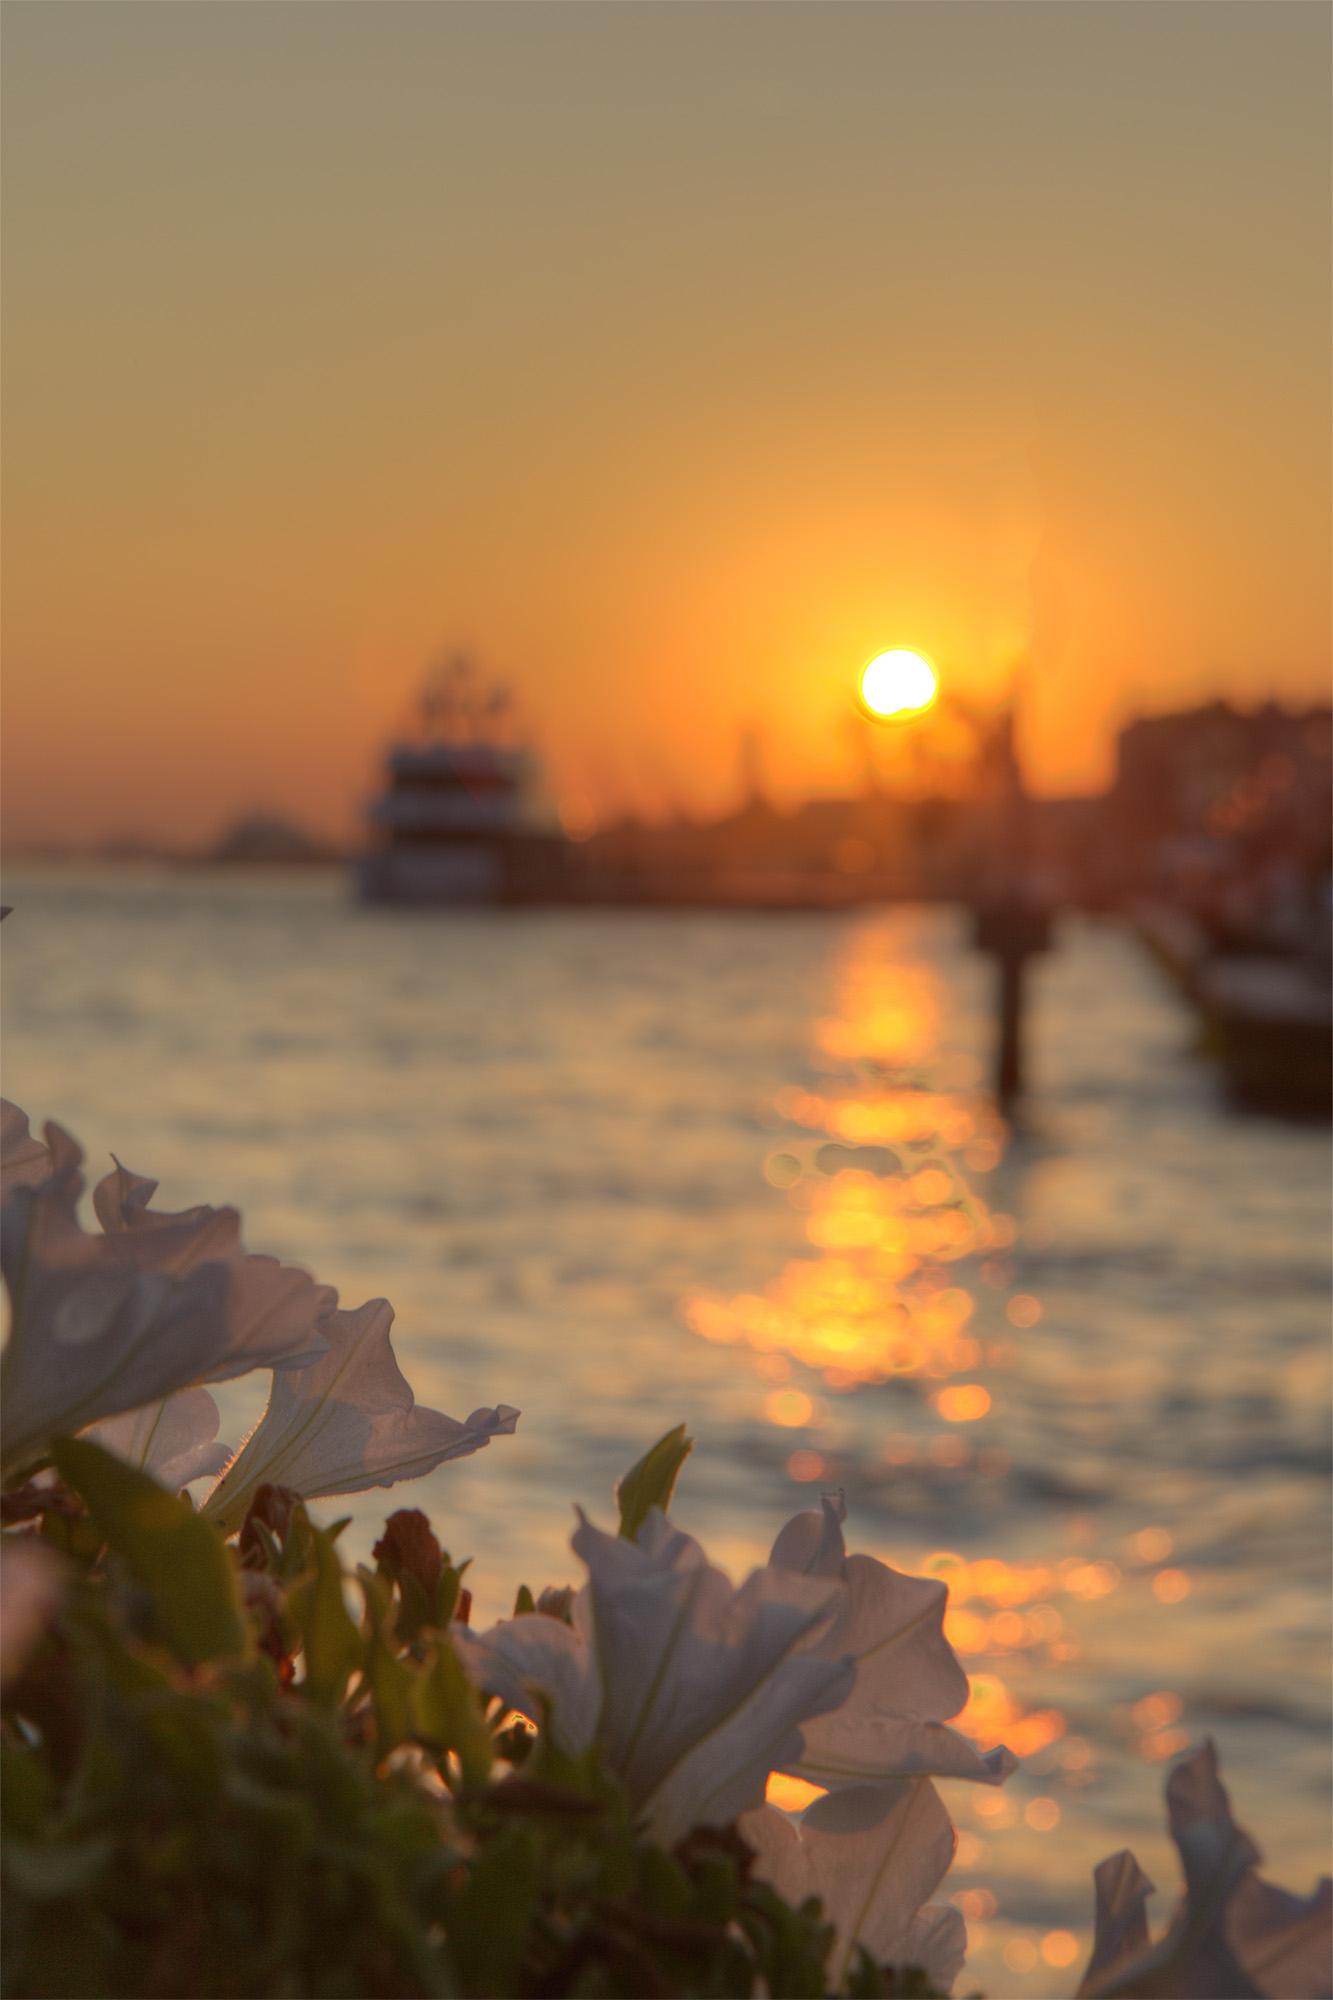 Venice Sunset, Adriatic, Tourism, Light, Majestic, HQ Photo